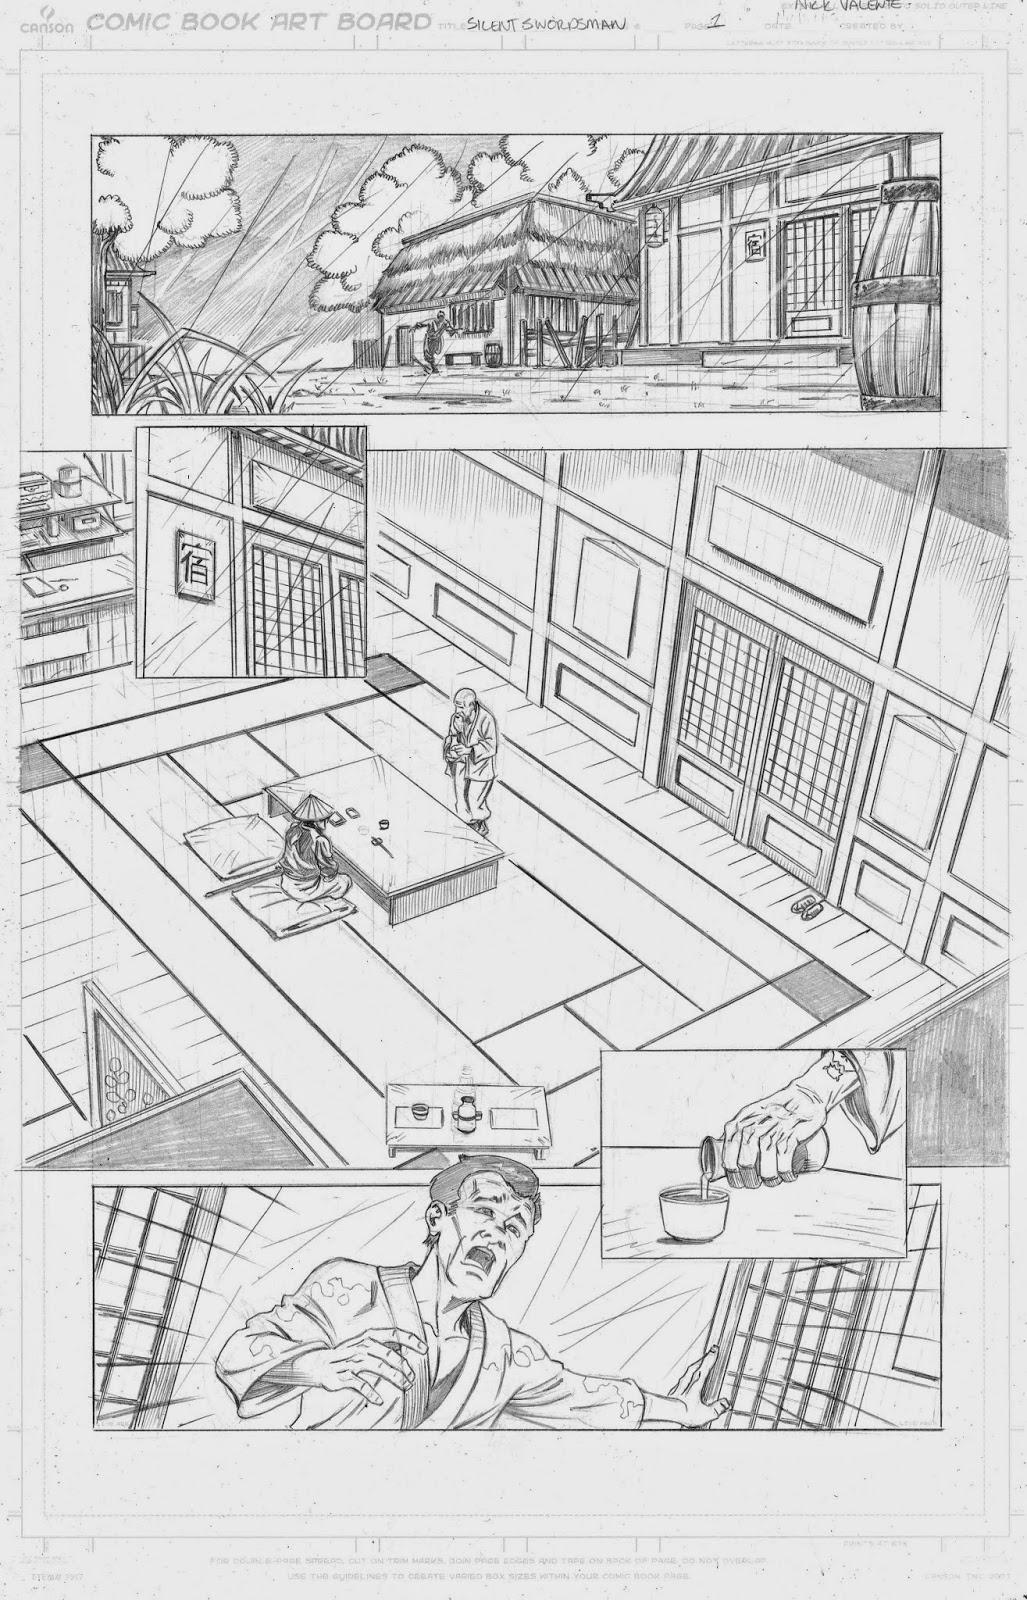 The Comic Art Portfolio of Nick Valente : Silent Swordsman short story